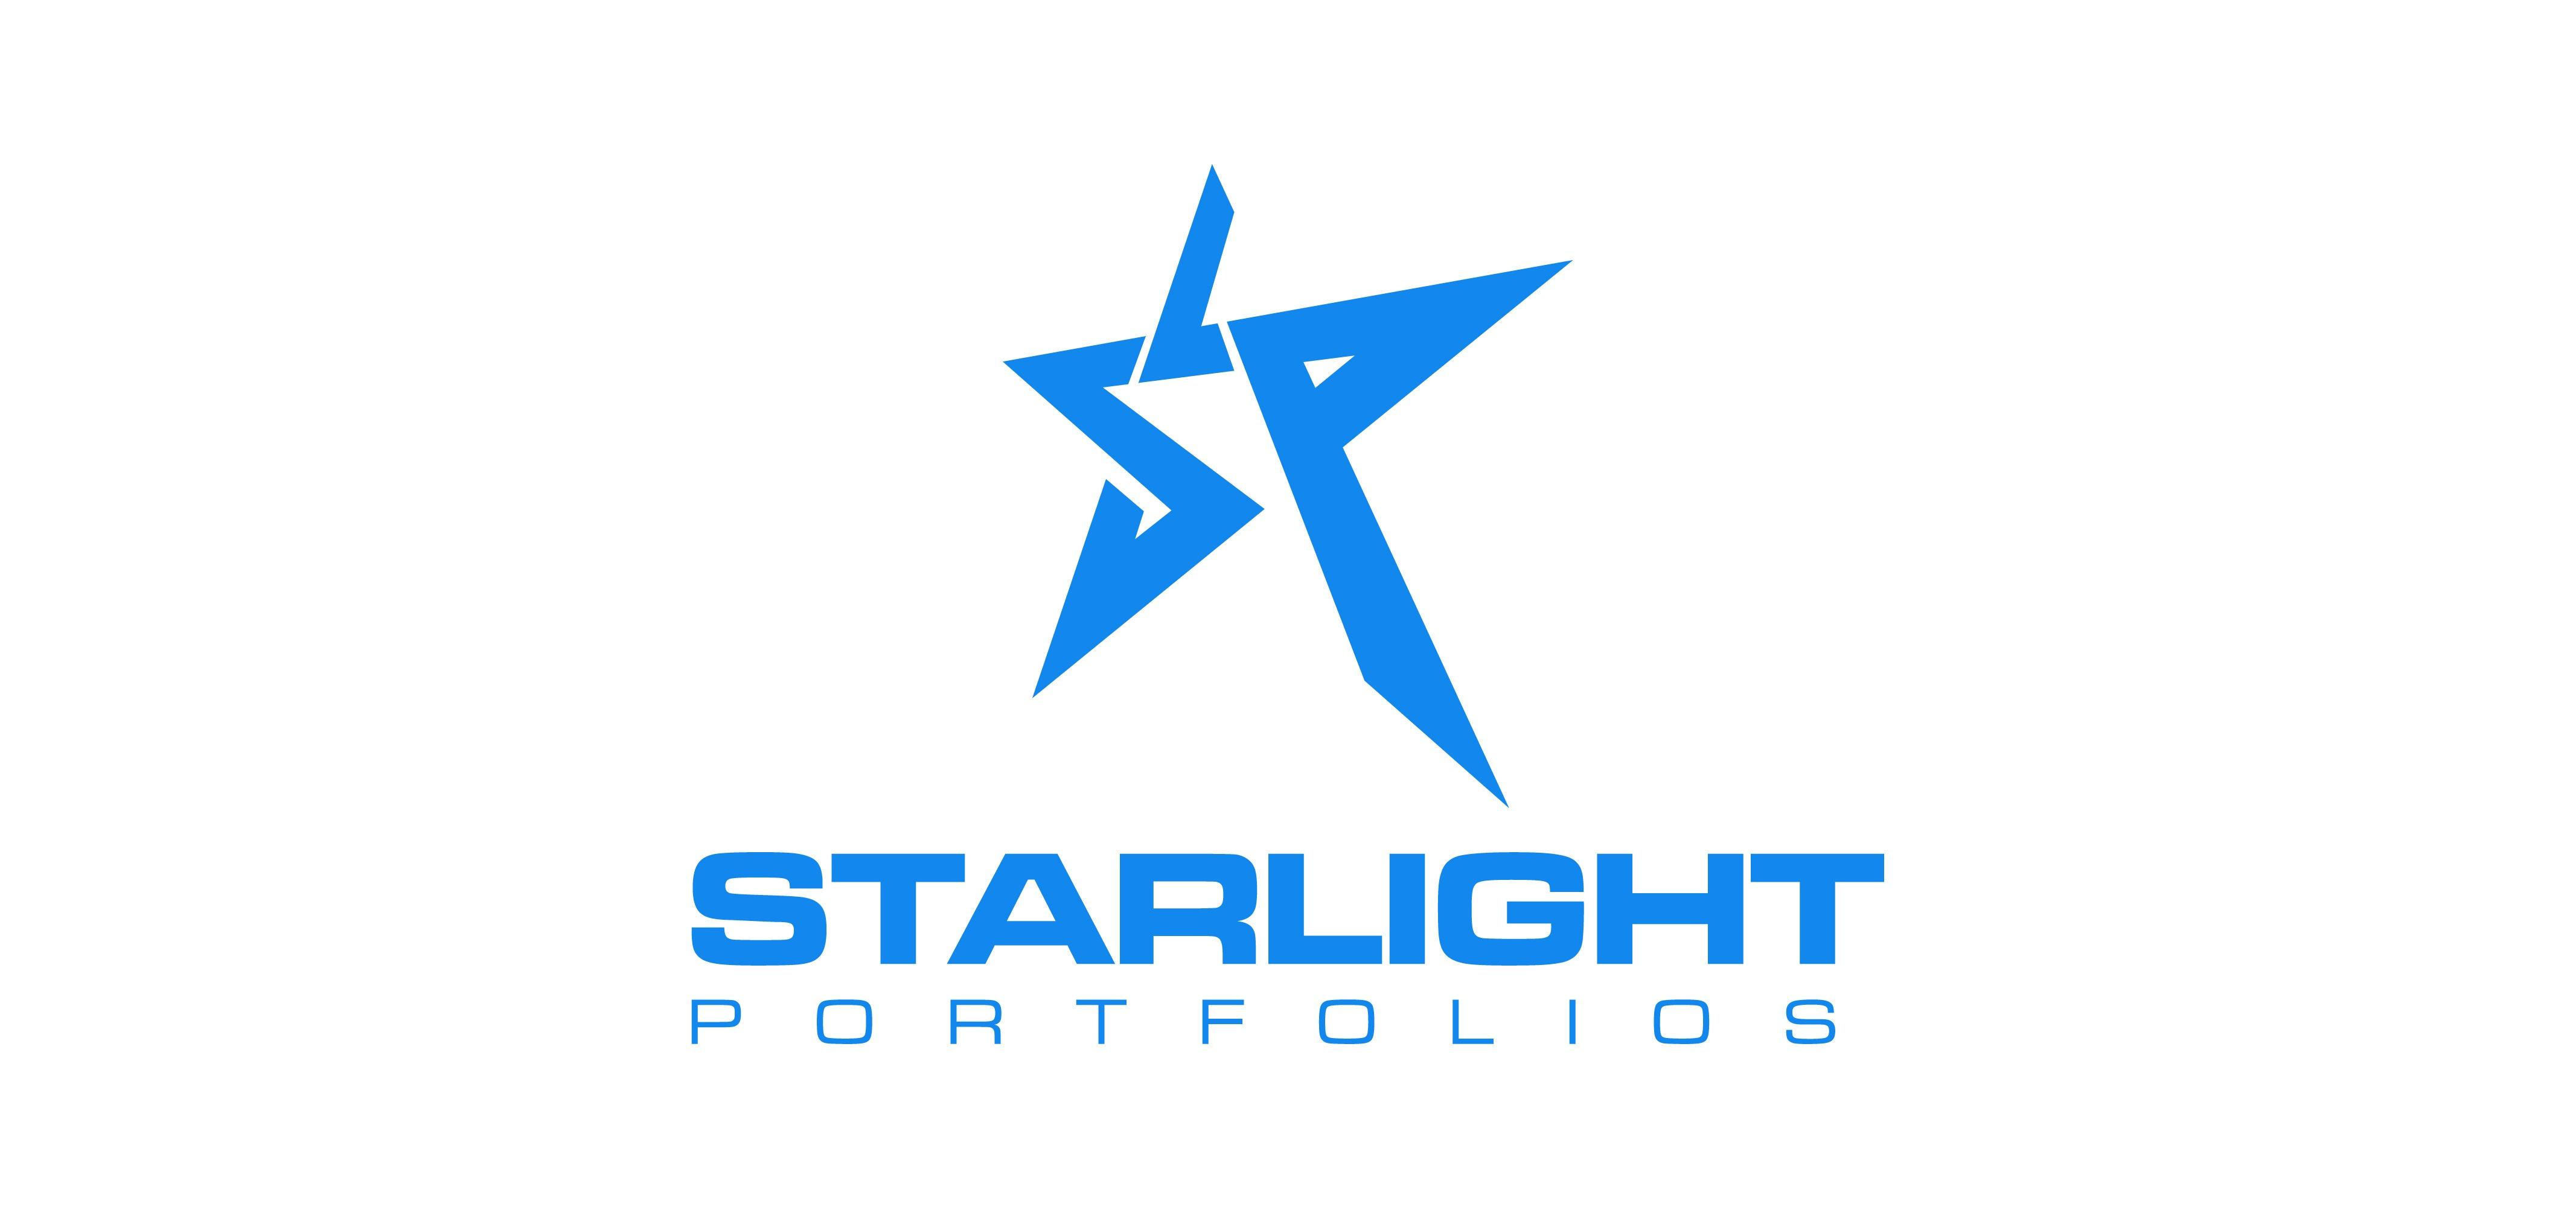 Starlight Portfolios Appoints Tony Brown to Advisor Council